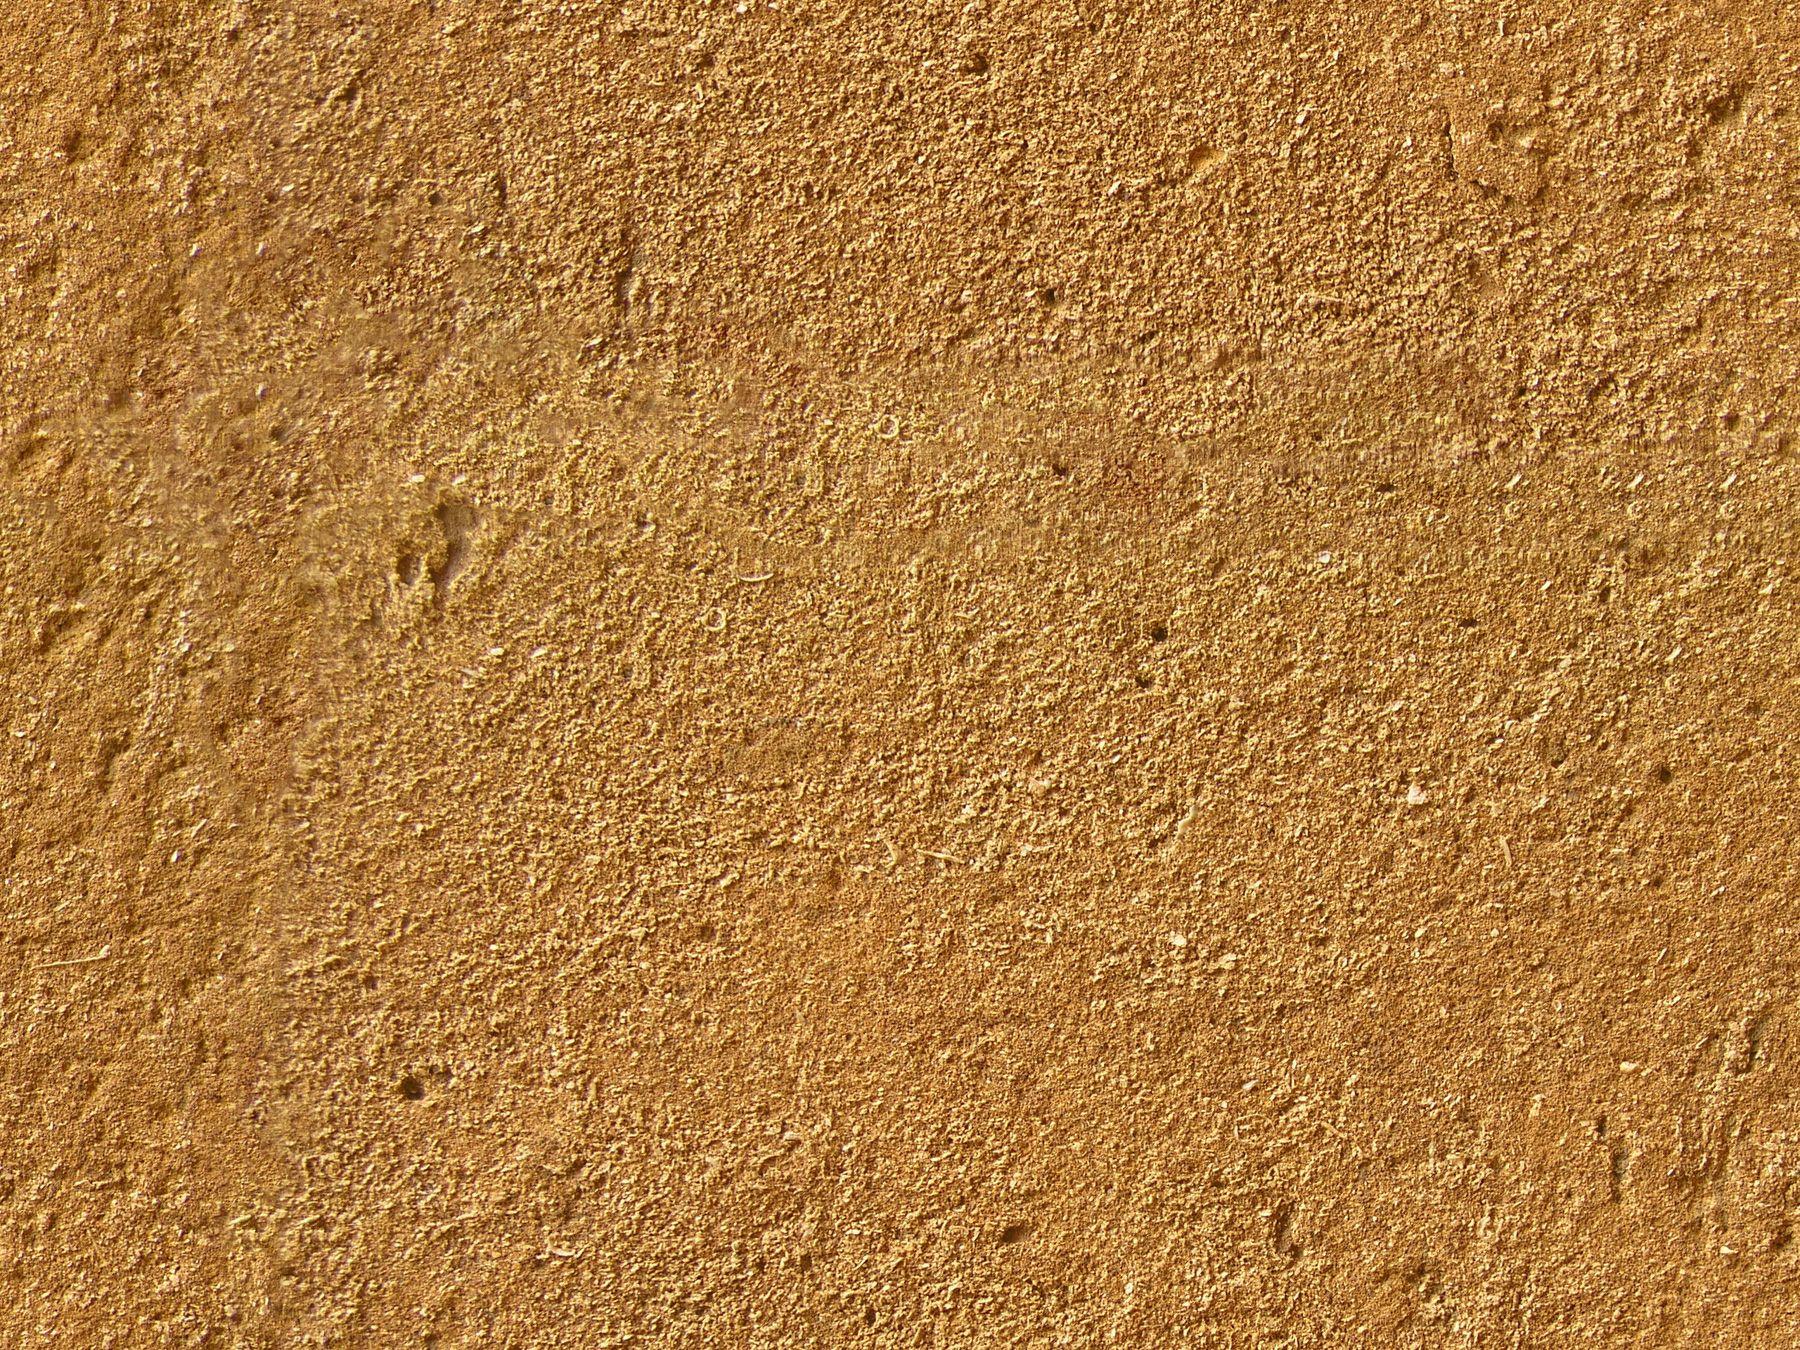 sand texture, sand, texture sand, beach, background, background ...